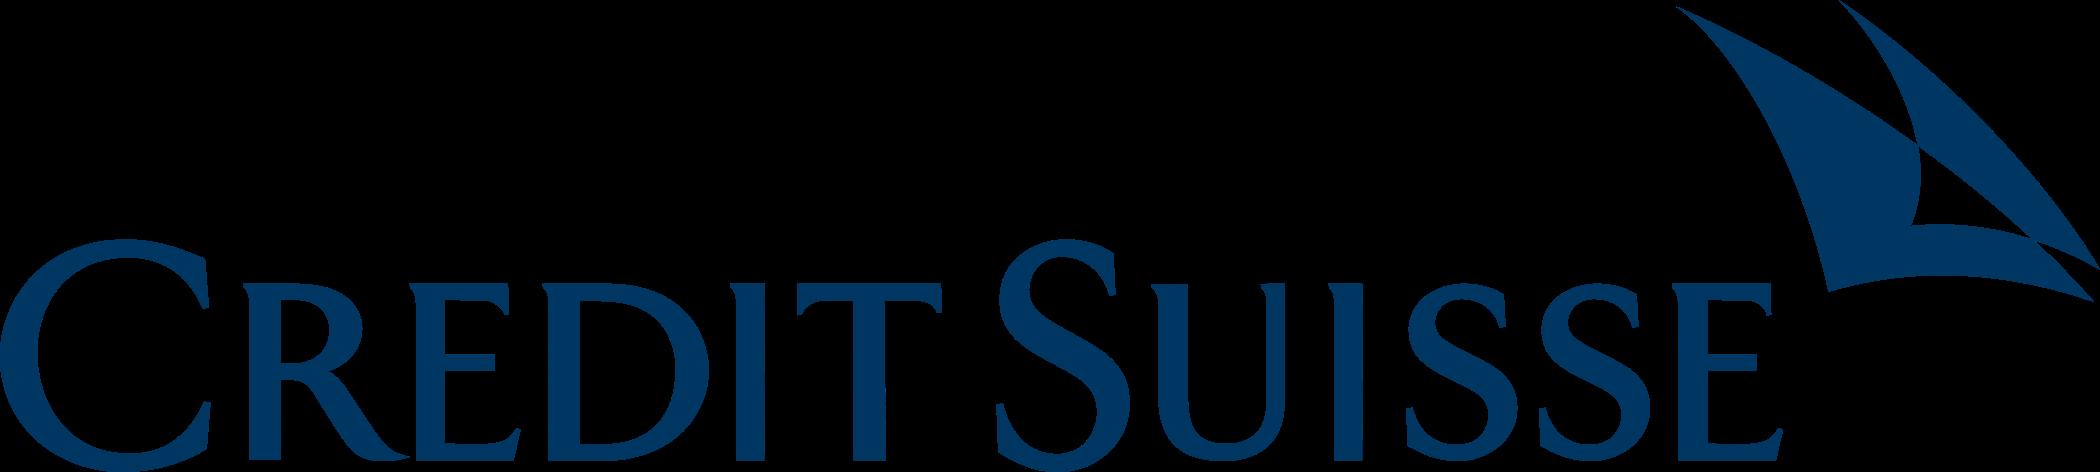 credt suisse logo 1 - Credit Suisse Logo